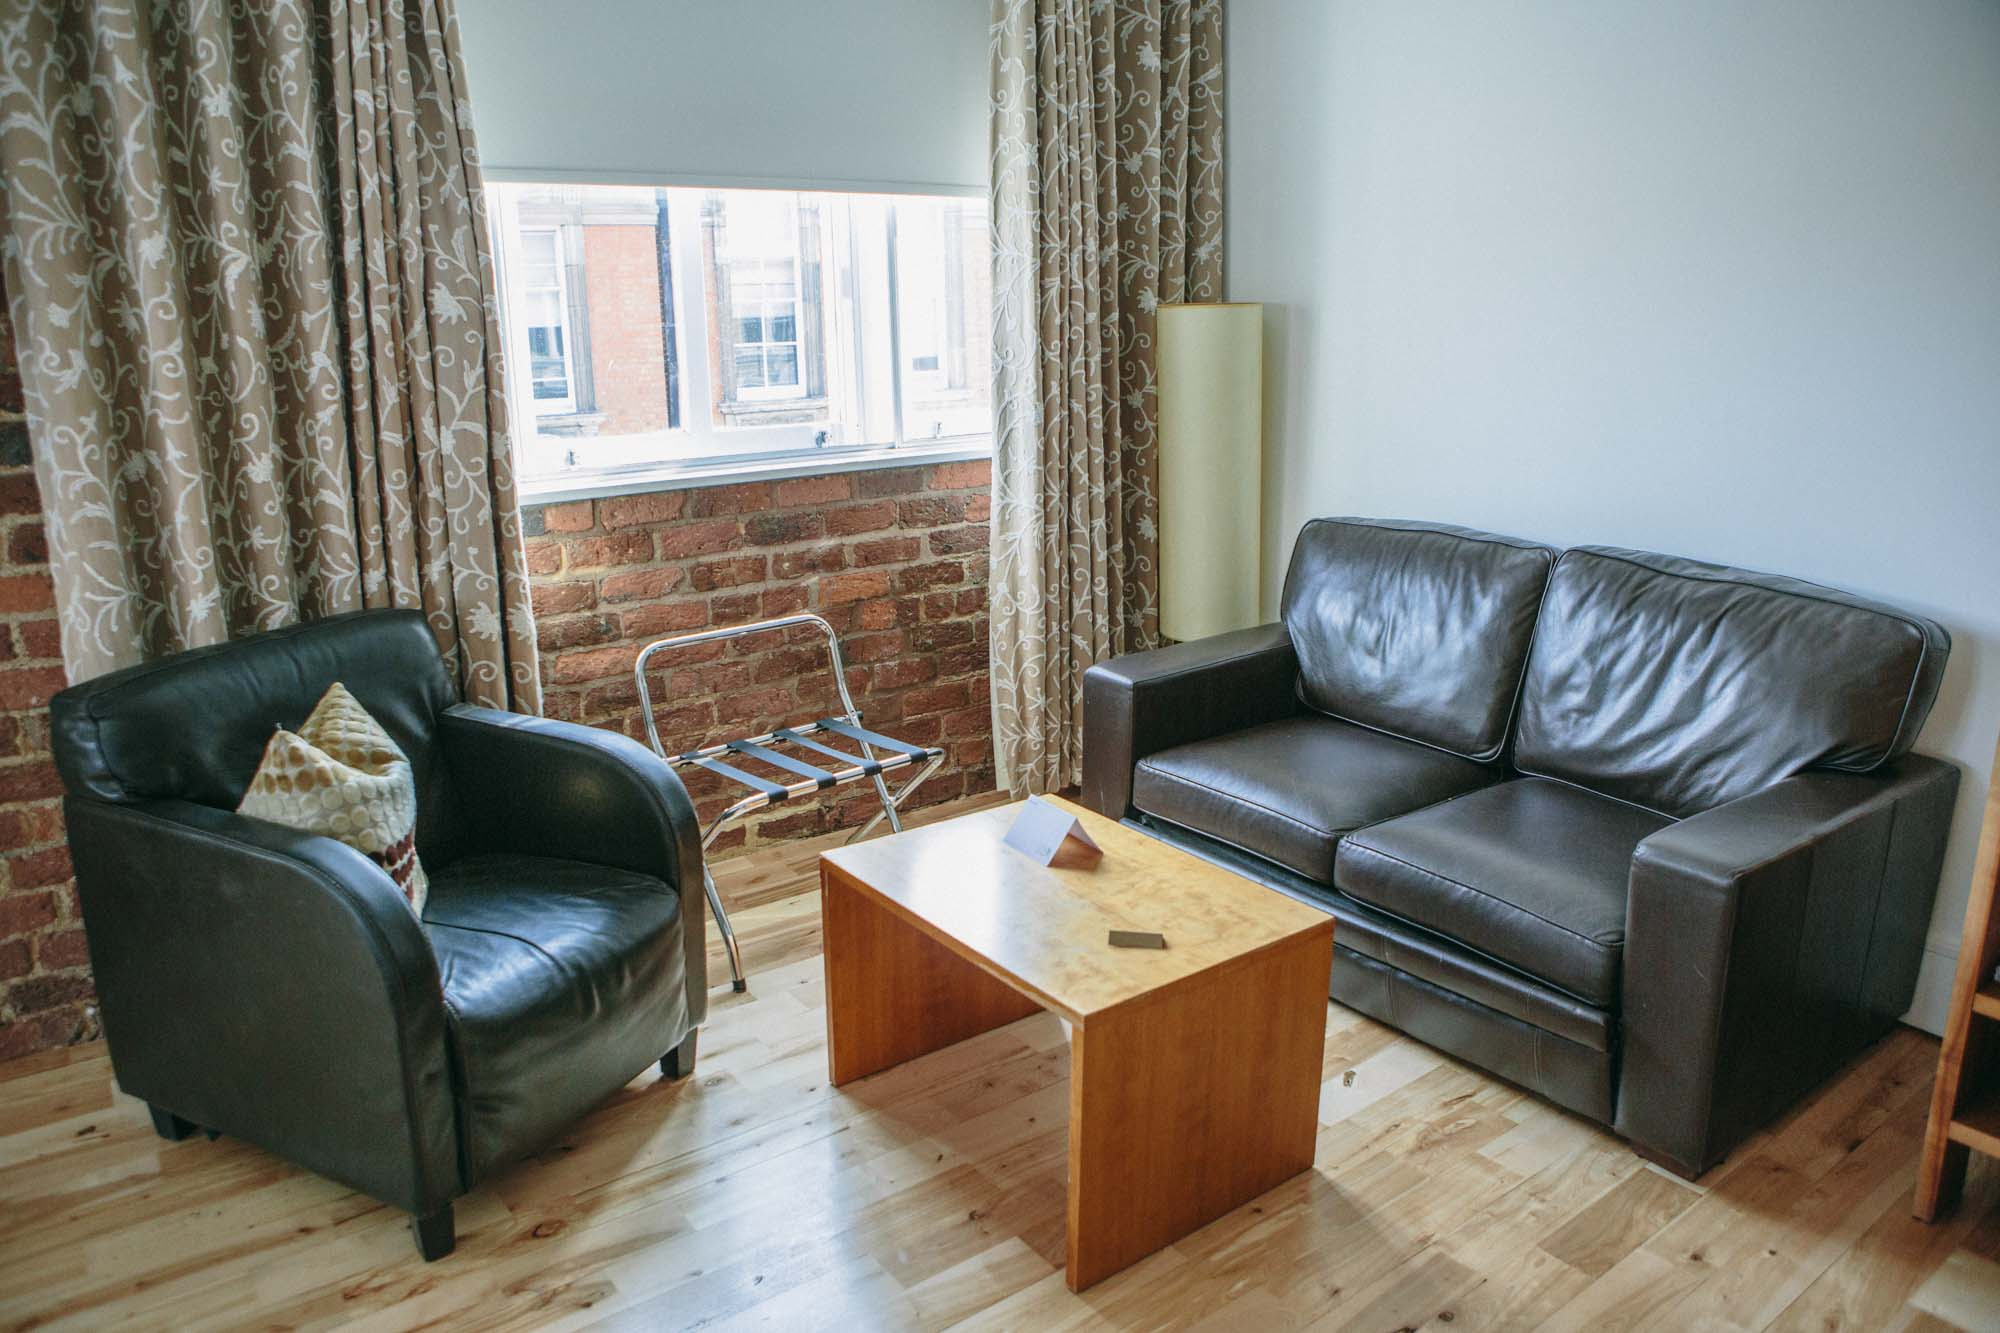 Best hotels in Liverpool – Hope Street Hotel